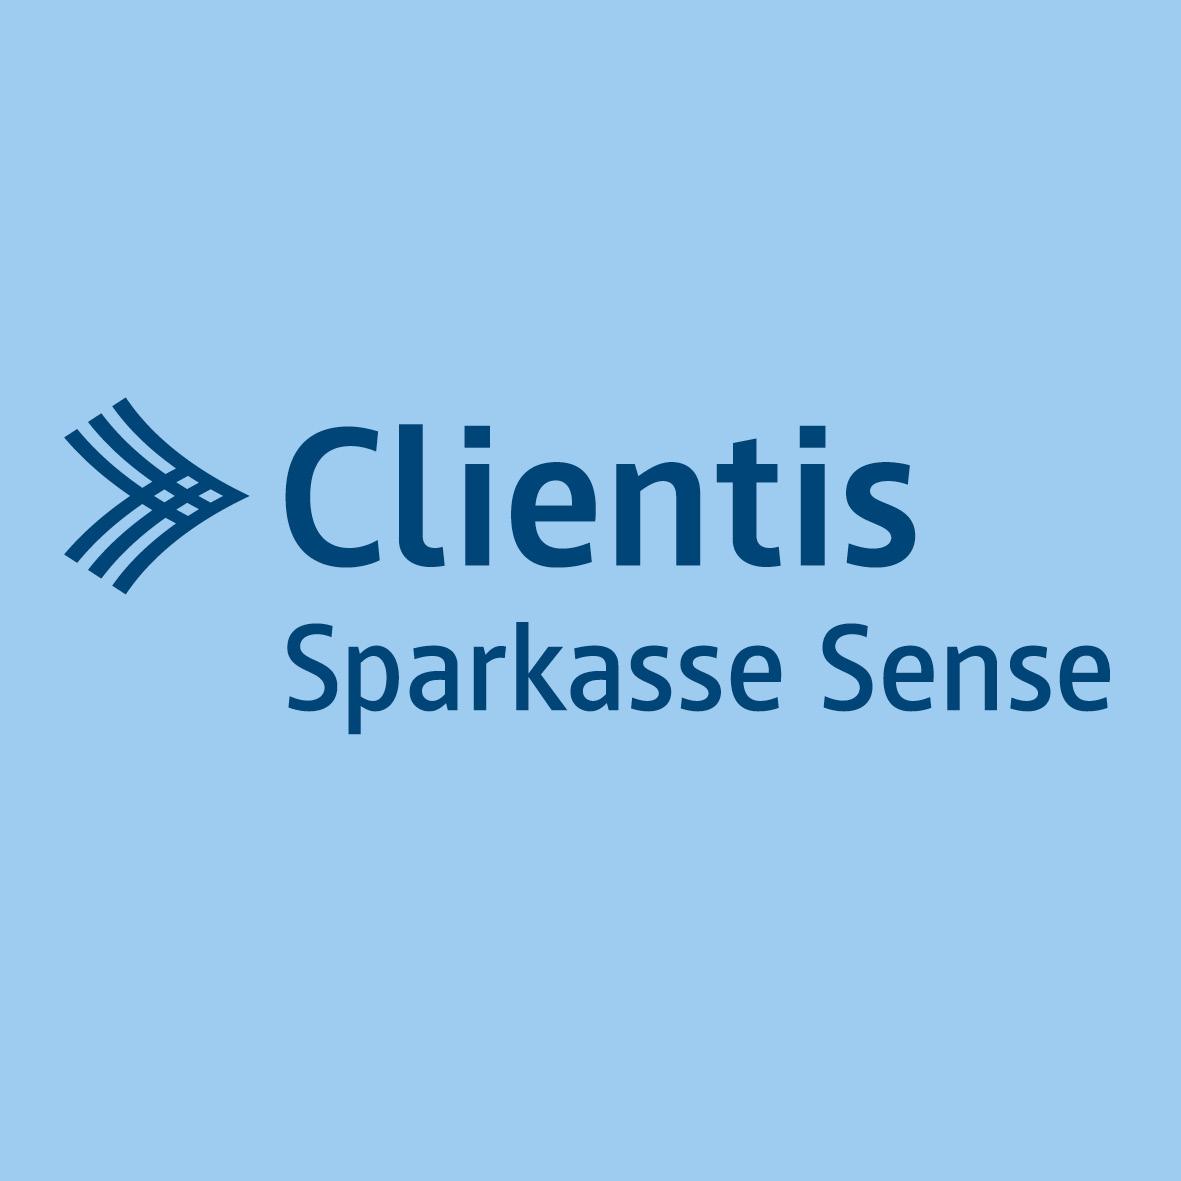 clientis-logo_50x50_online_rgb